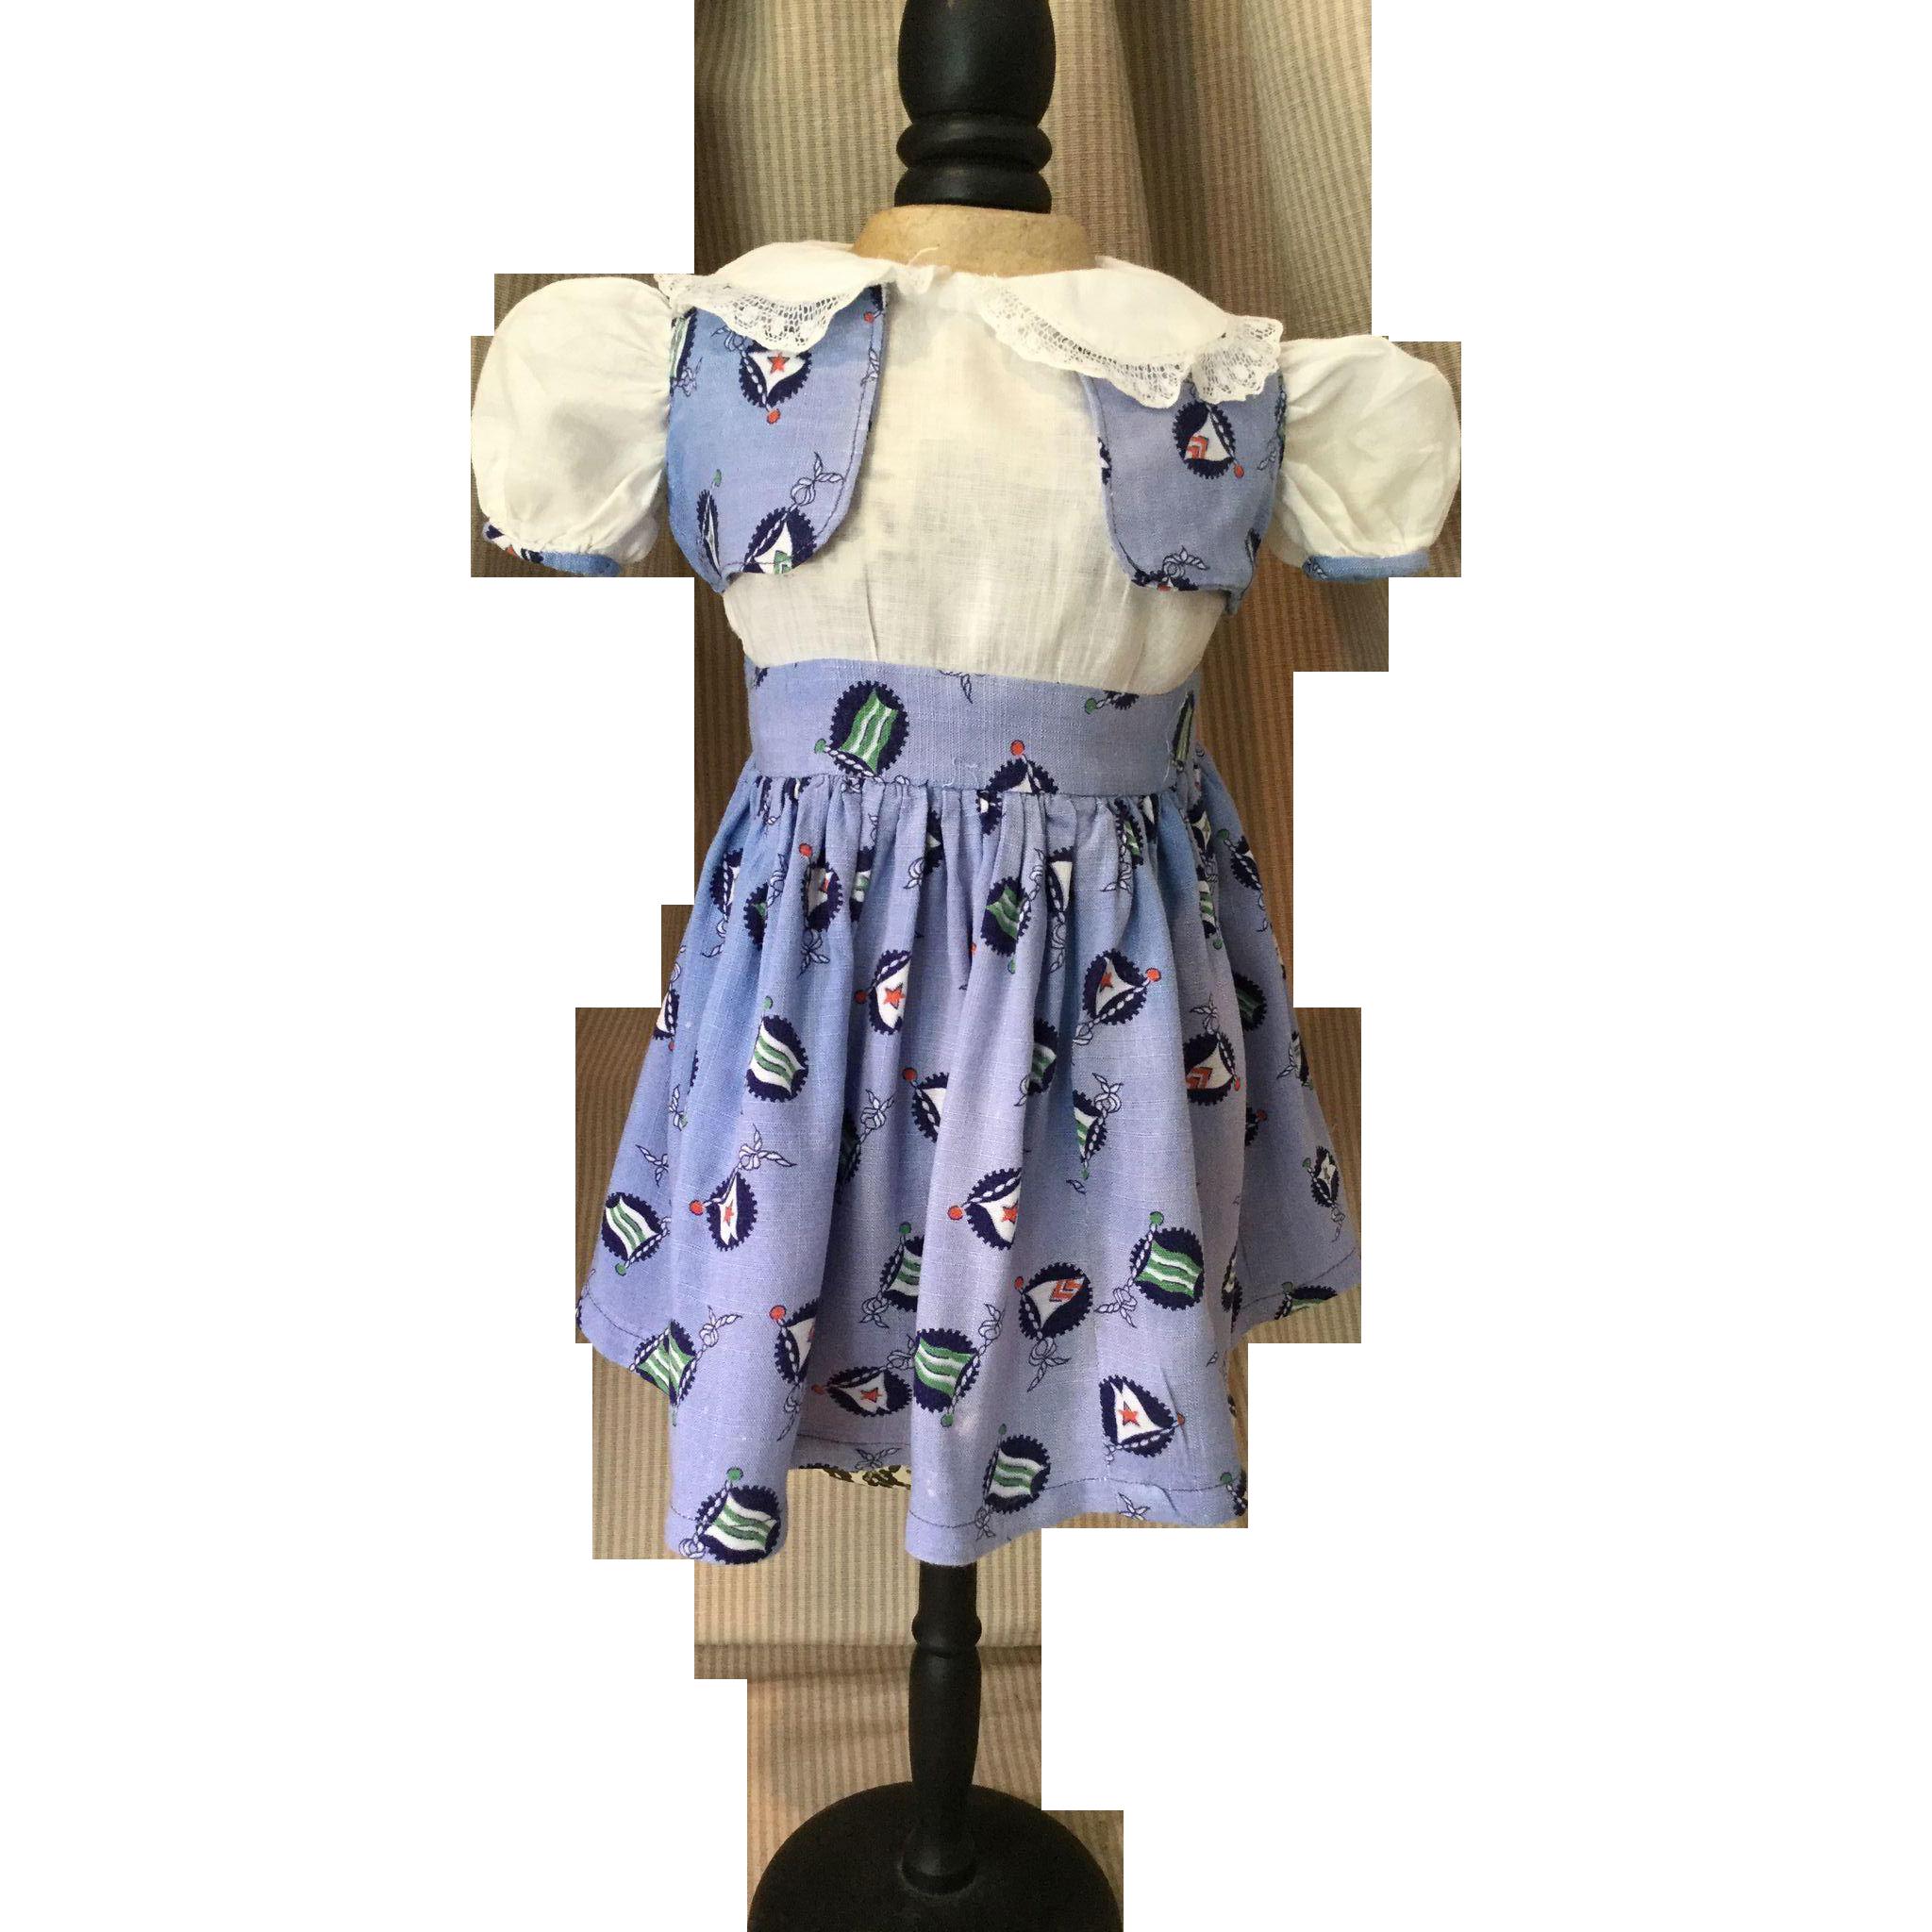 C.1940/50s Two Piece Dress and Vest Set